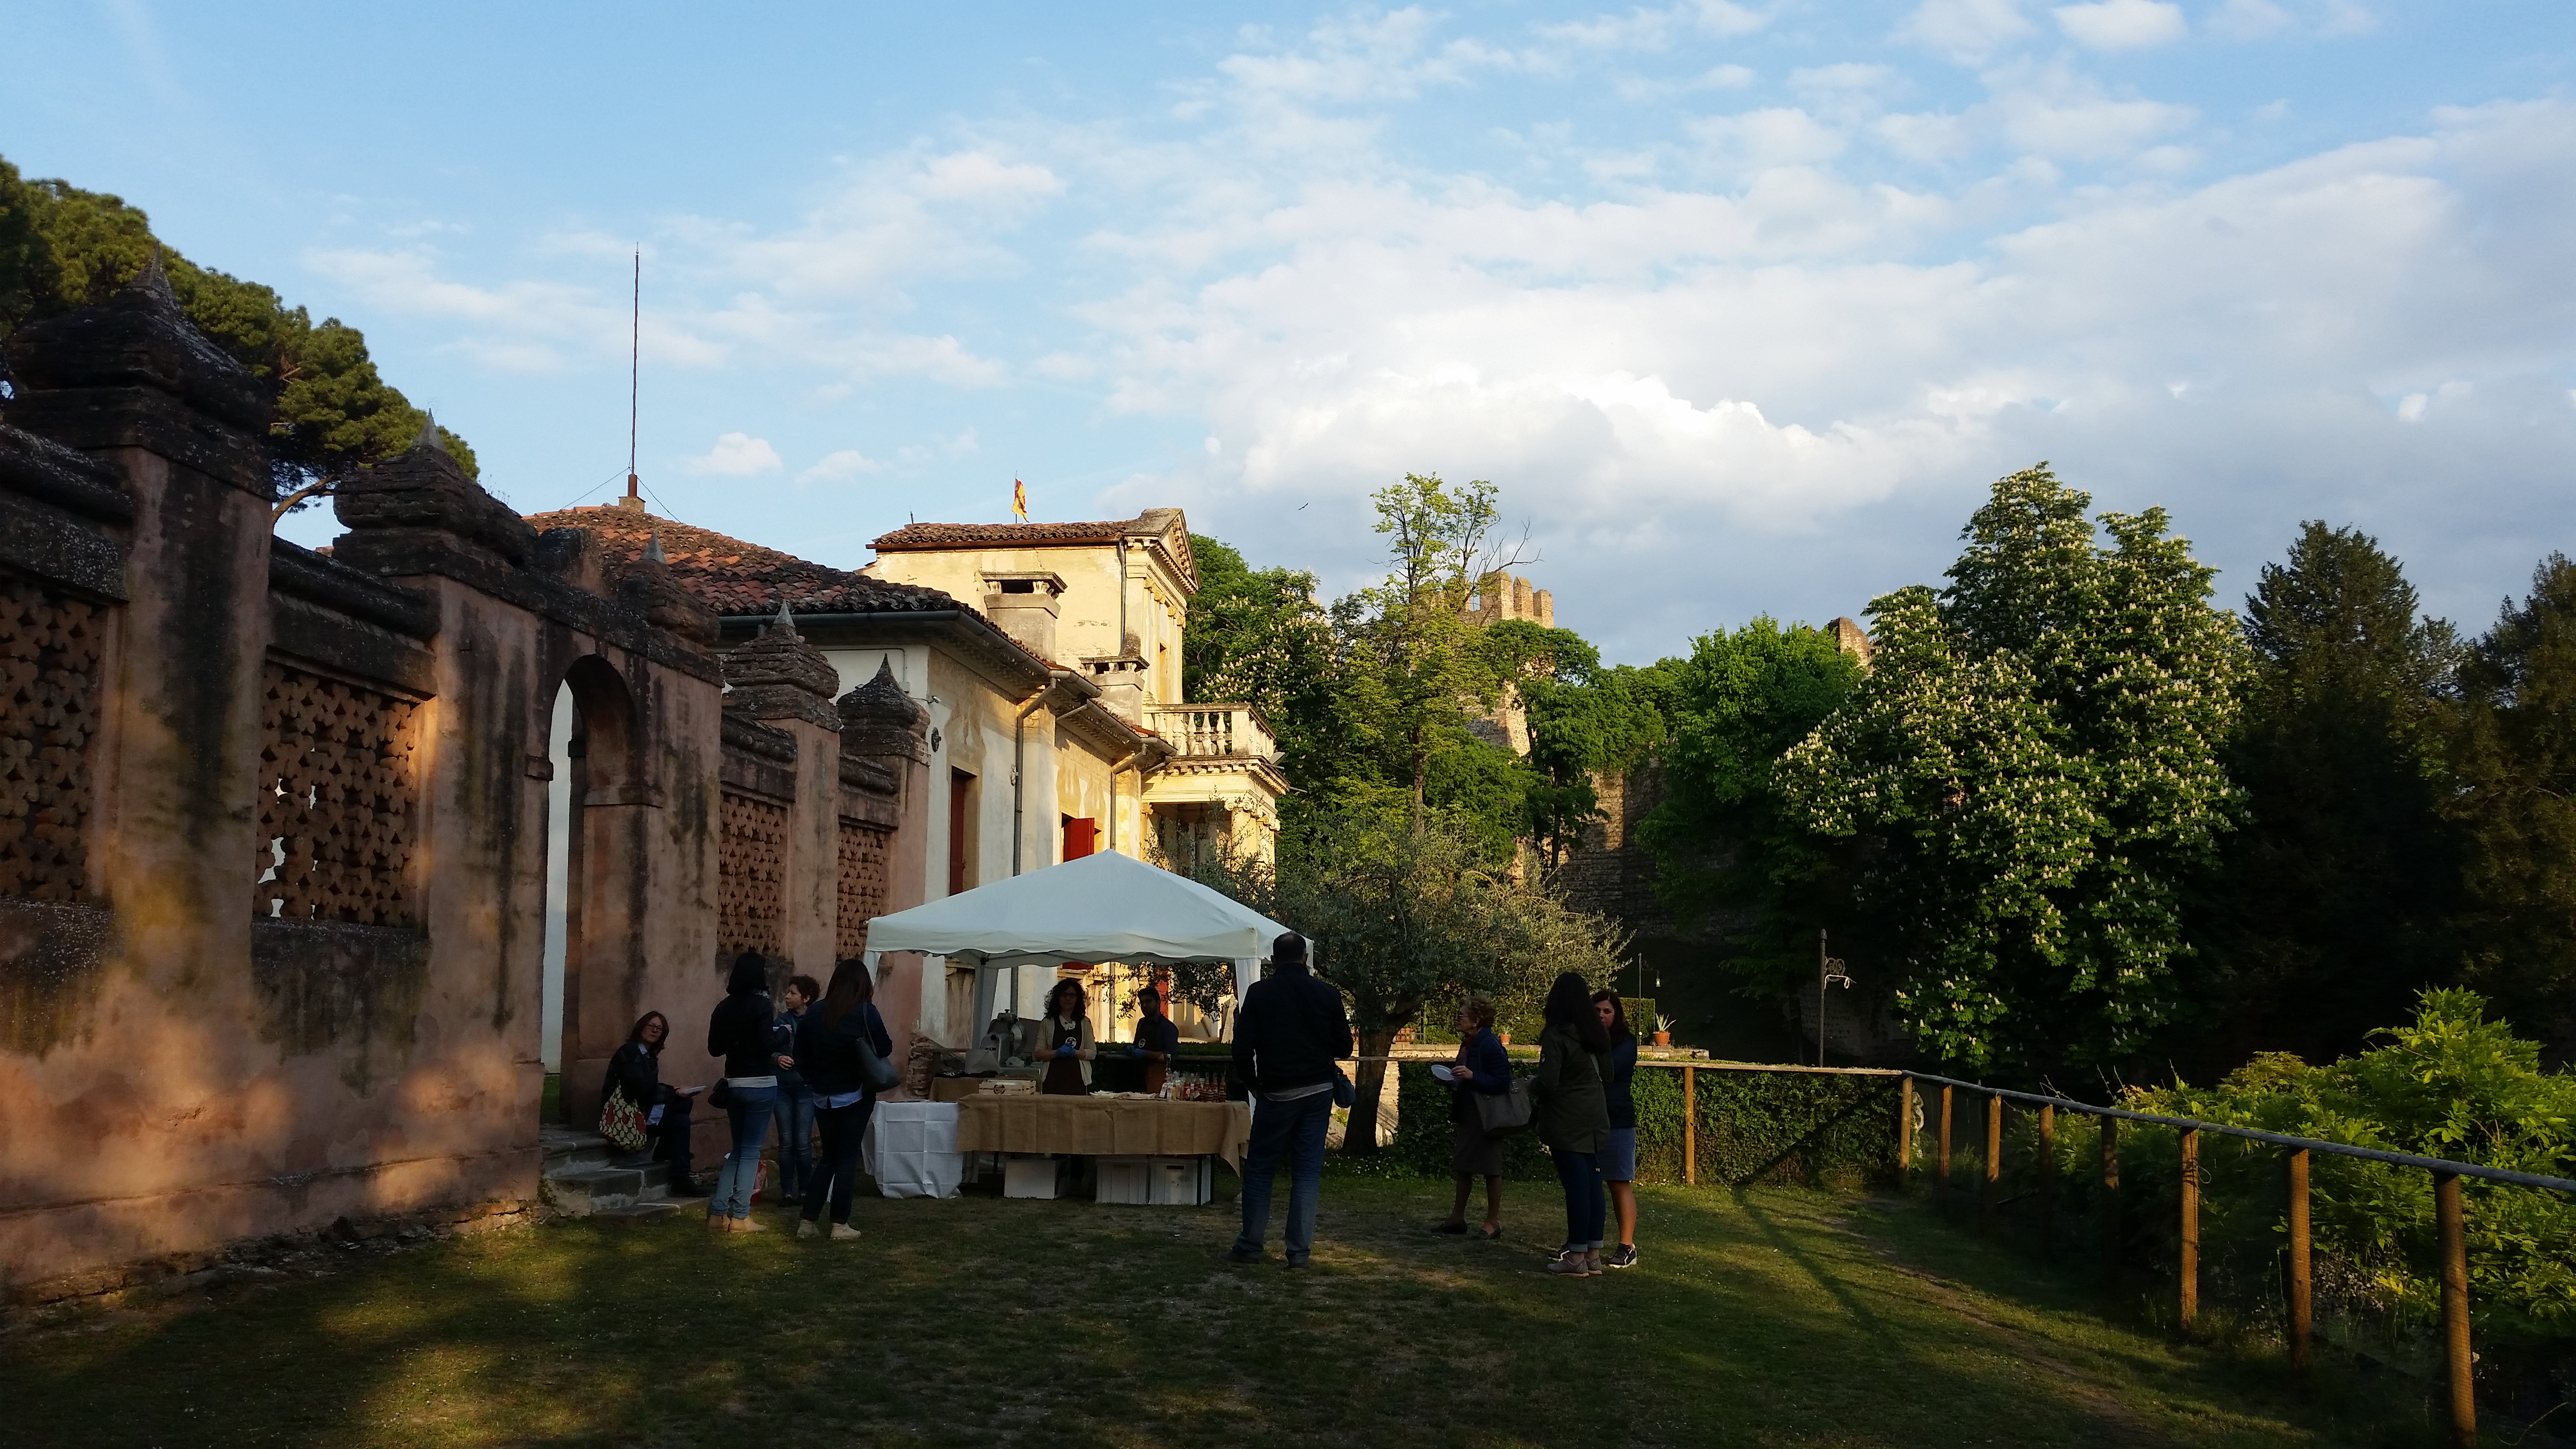 Nerka in Villa Contarena ad Este | Ivan Zogia